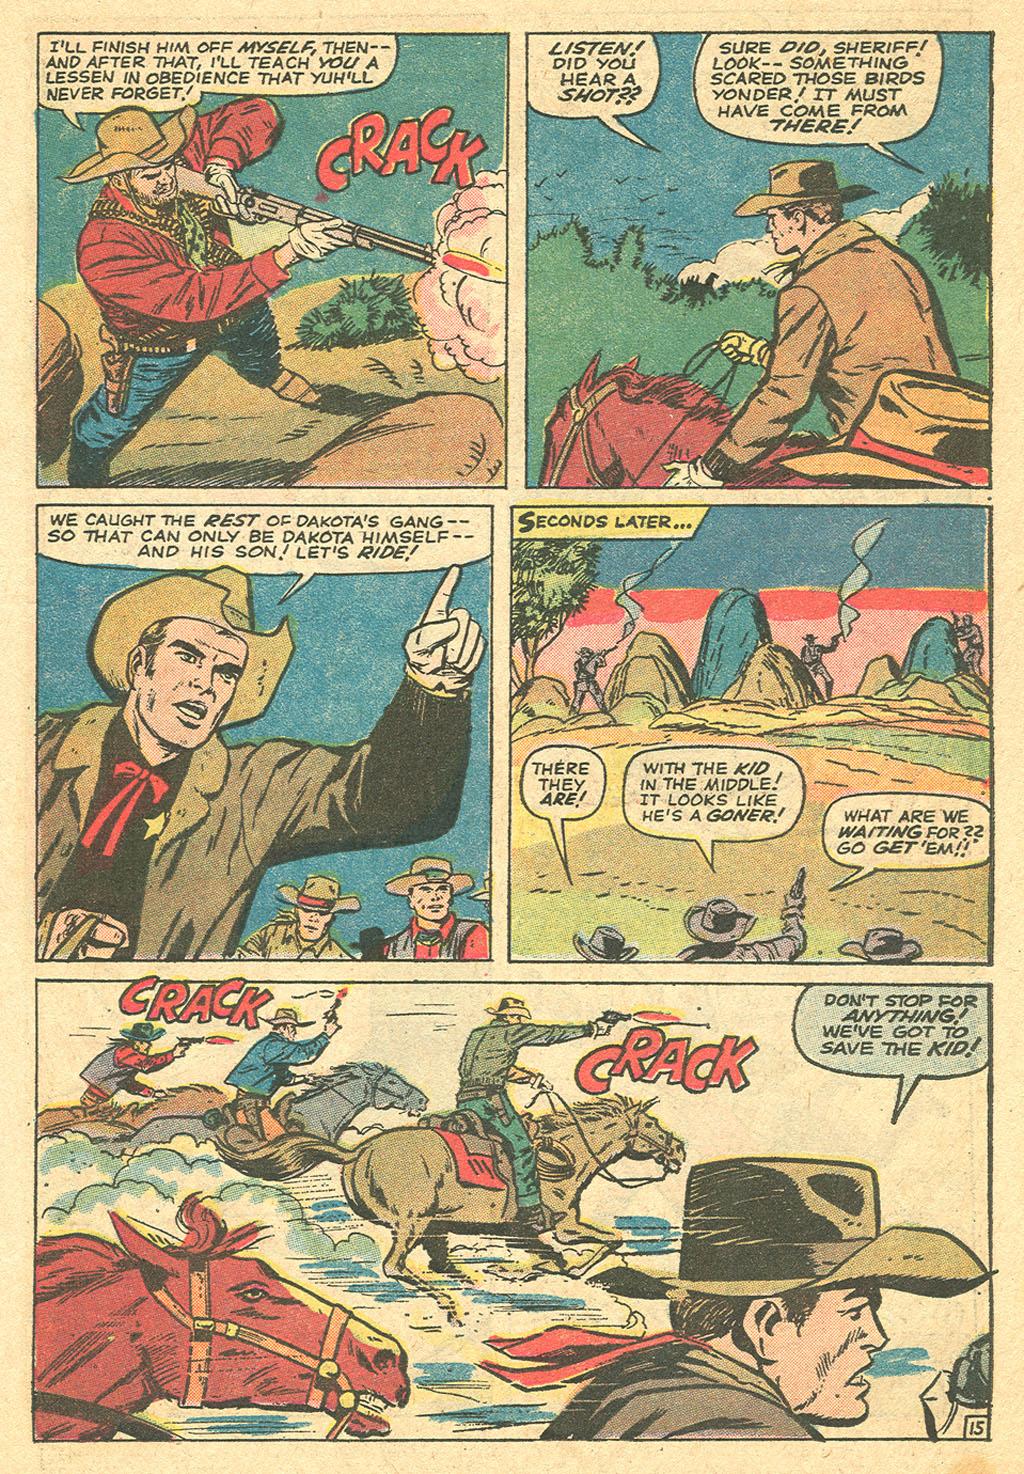 Read online Two-Gun Kid comic -  Issue #107 - 22